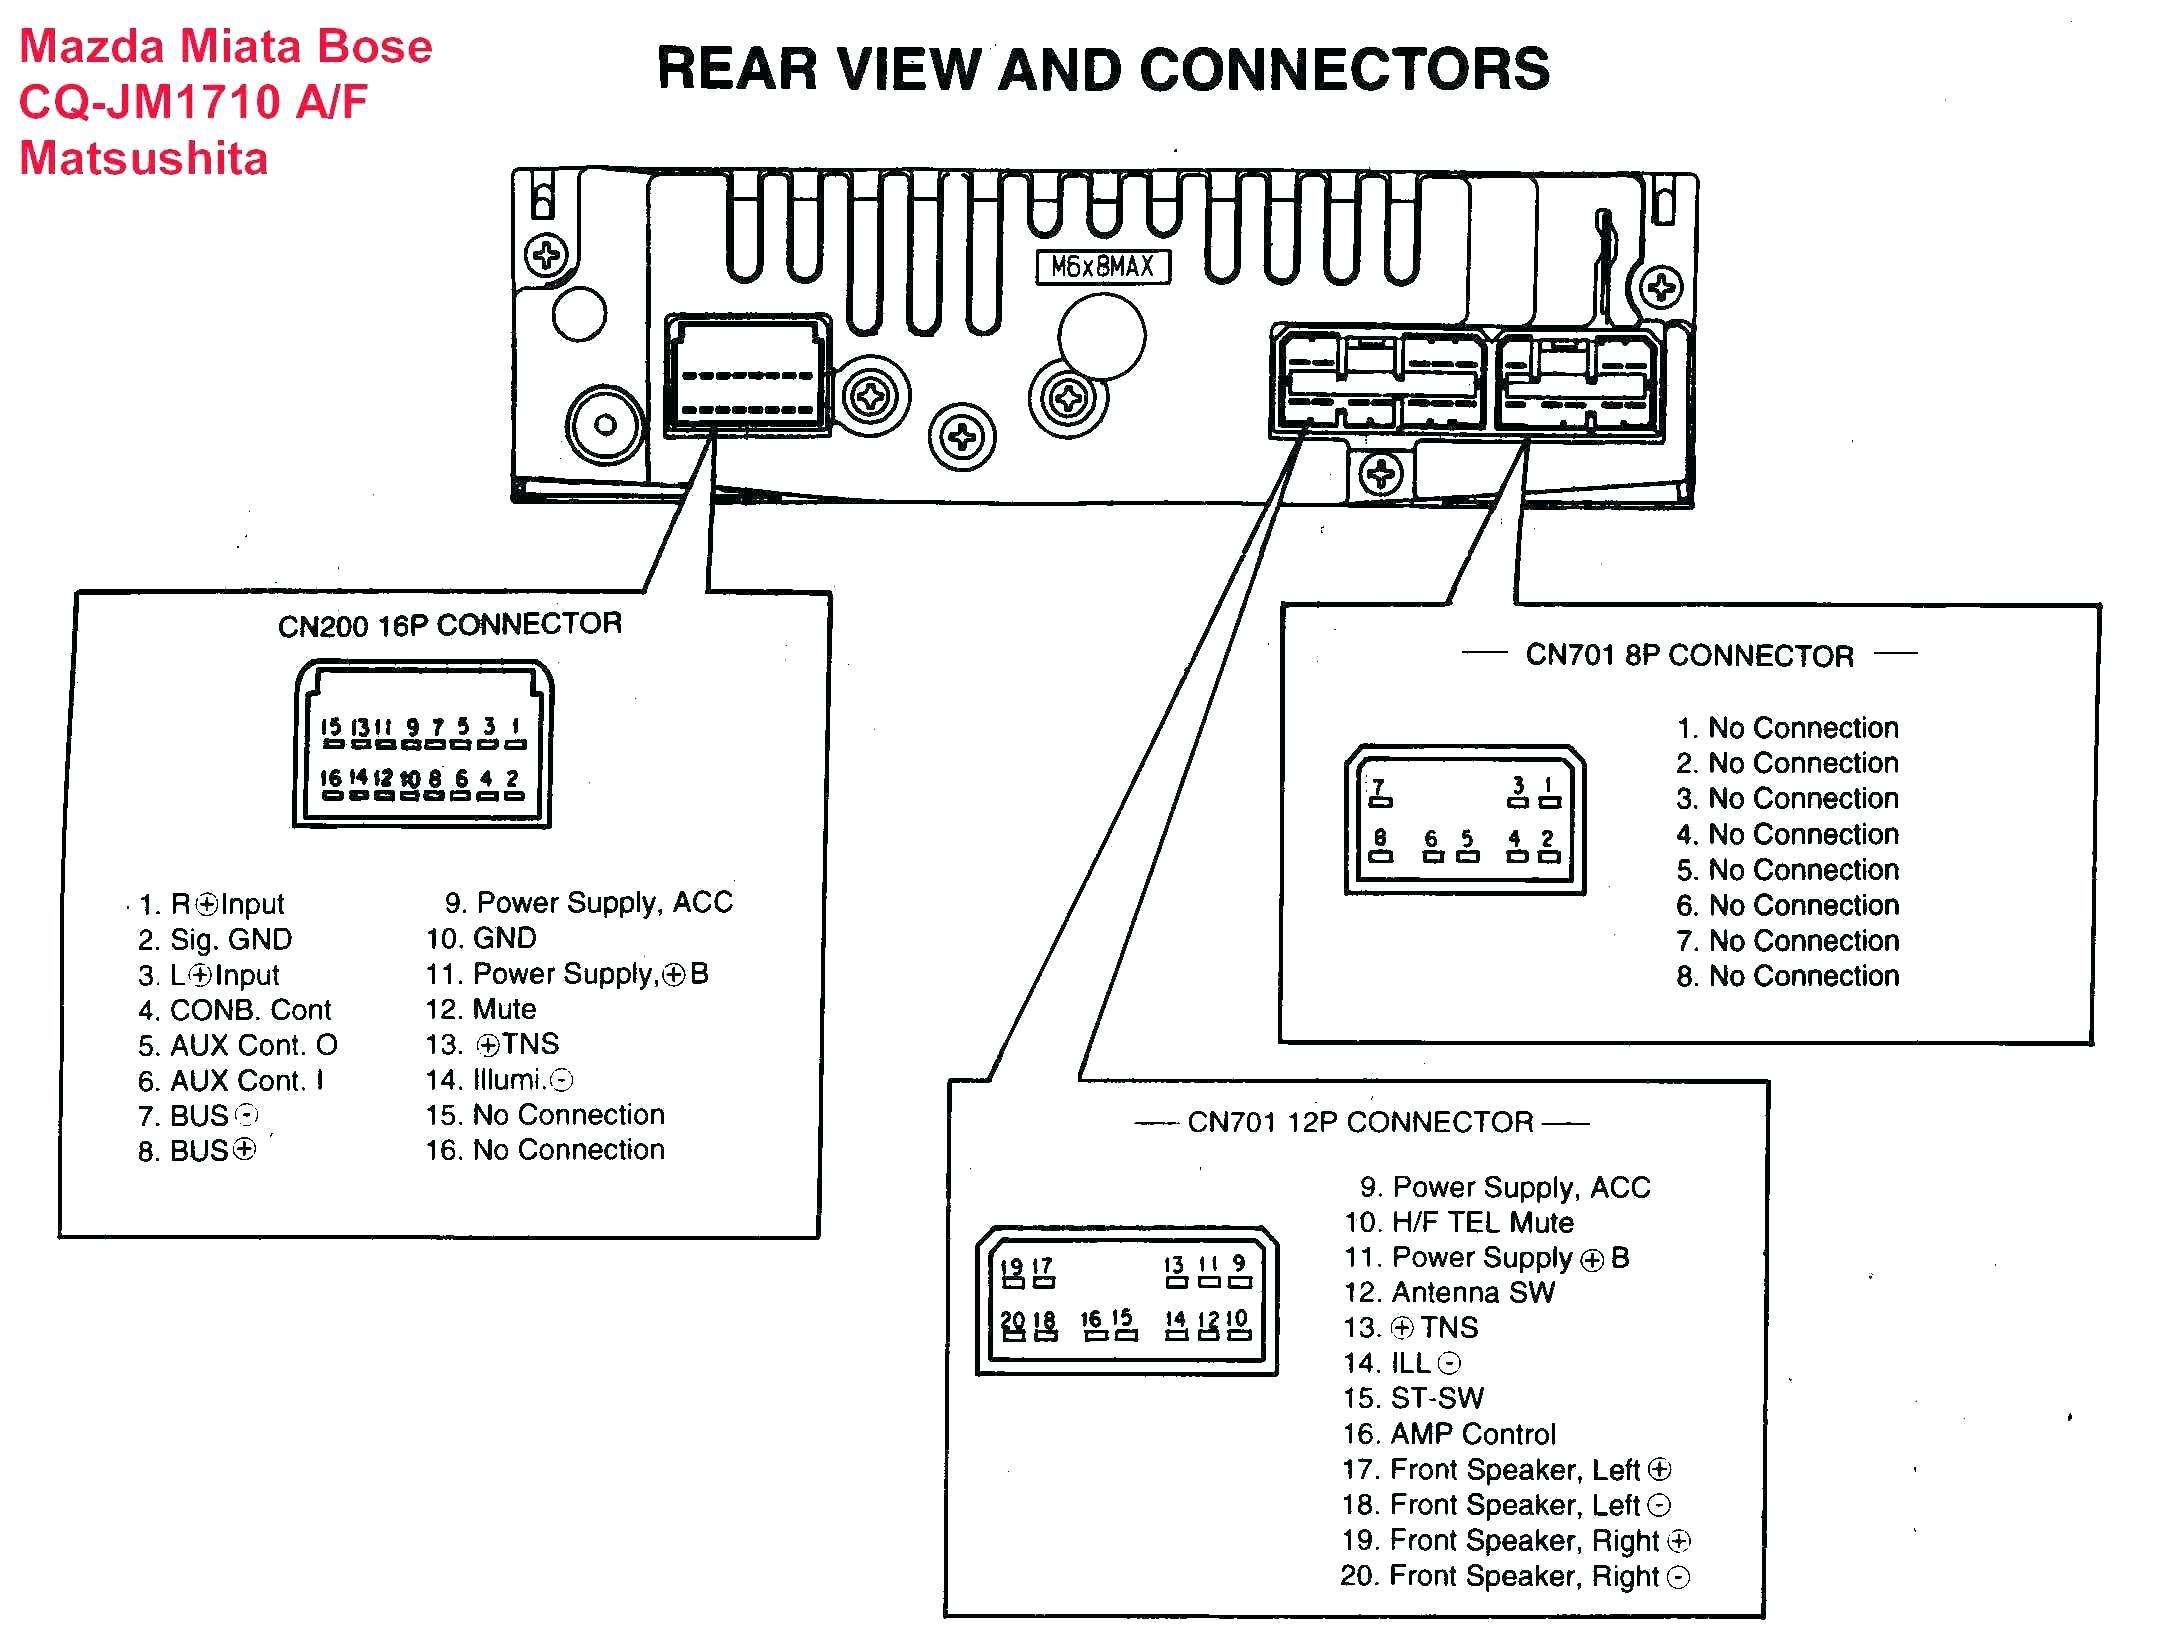 Sony Cdx Gt06 Wiring Diagram - Wiring Diagram All Sony Cd Player Wiring Diagram on cd player wiring harness diagram, a/c wiring diagram, sony cd player system, jvc cd player wiring diagram, nissan cd player wiring diagram, car cd player wiring diagram, amp wiring diagram, sony deck wiring-diagram, sony stereo wire harness diagram, sony cd player remote control, stereo wiring diagram, sony explode stereo wire diagram, ford cd player wiring diagram, clarion cd player wiring diagram, lights wiring diagram, kenwood cd player wiring diagram, surround sound wiring diagram, sony cd player parts, sony cd player installation,